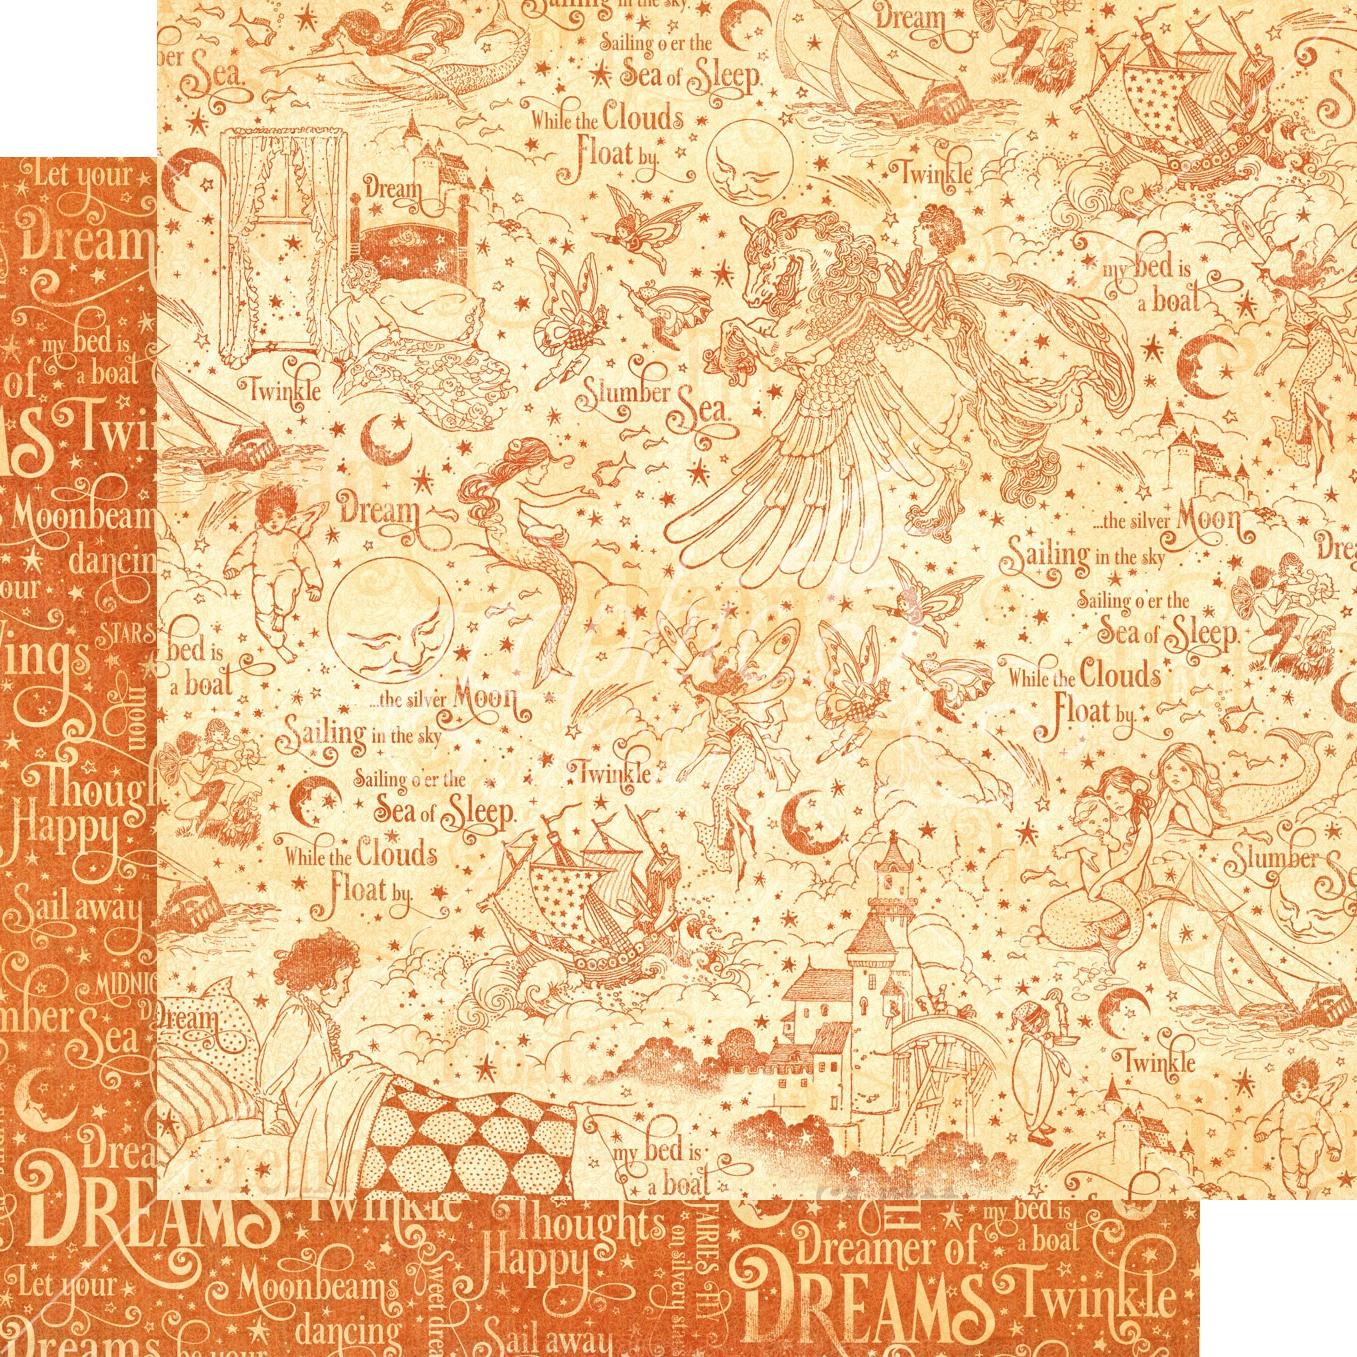 Dreamland-Slumber Sea 12x12 paper